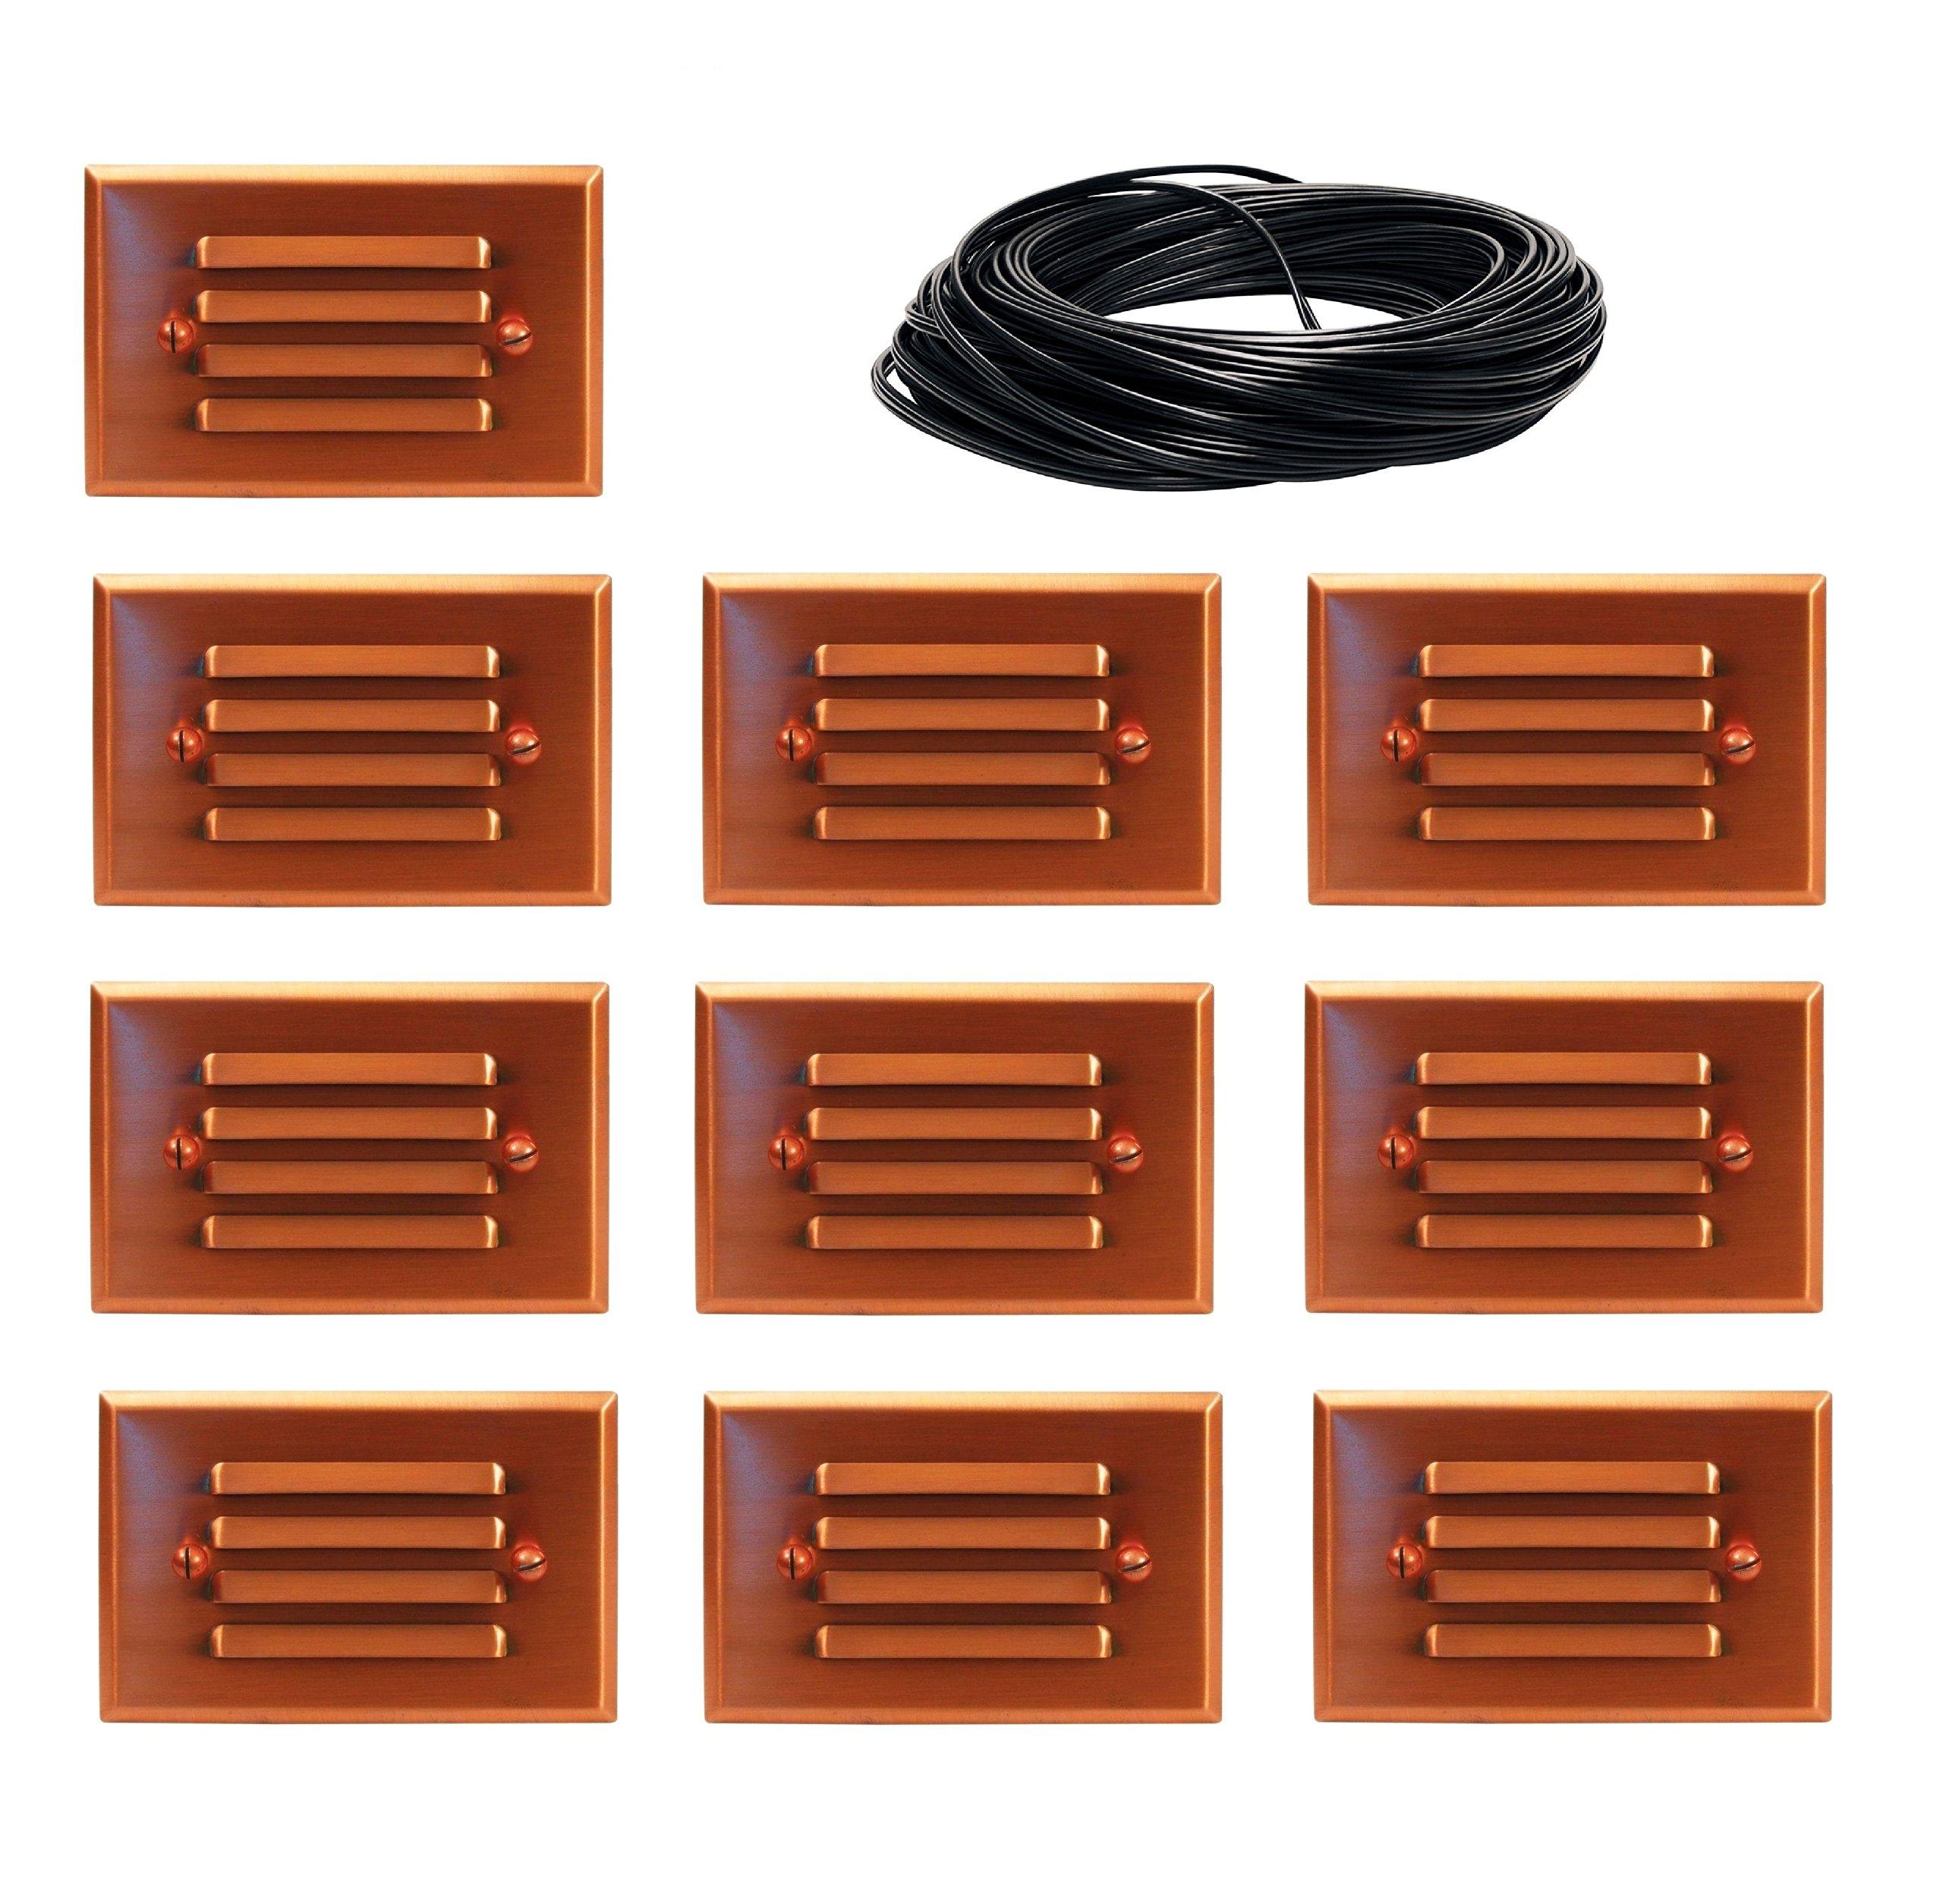 10 Pack Malibu 8421-2401-01 LED Half Brick Deck Step Light Copper + 100 ft landscape wire NO TRANSFORMER INCLUDED. BY MALIBU DISTRIBUTION